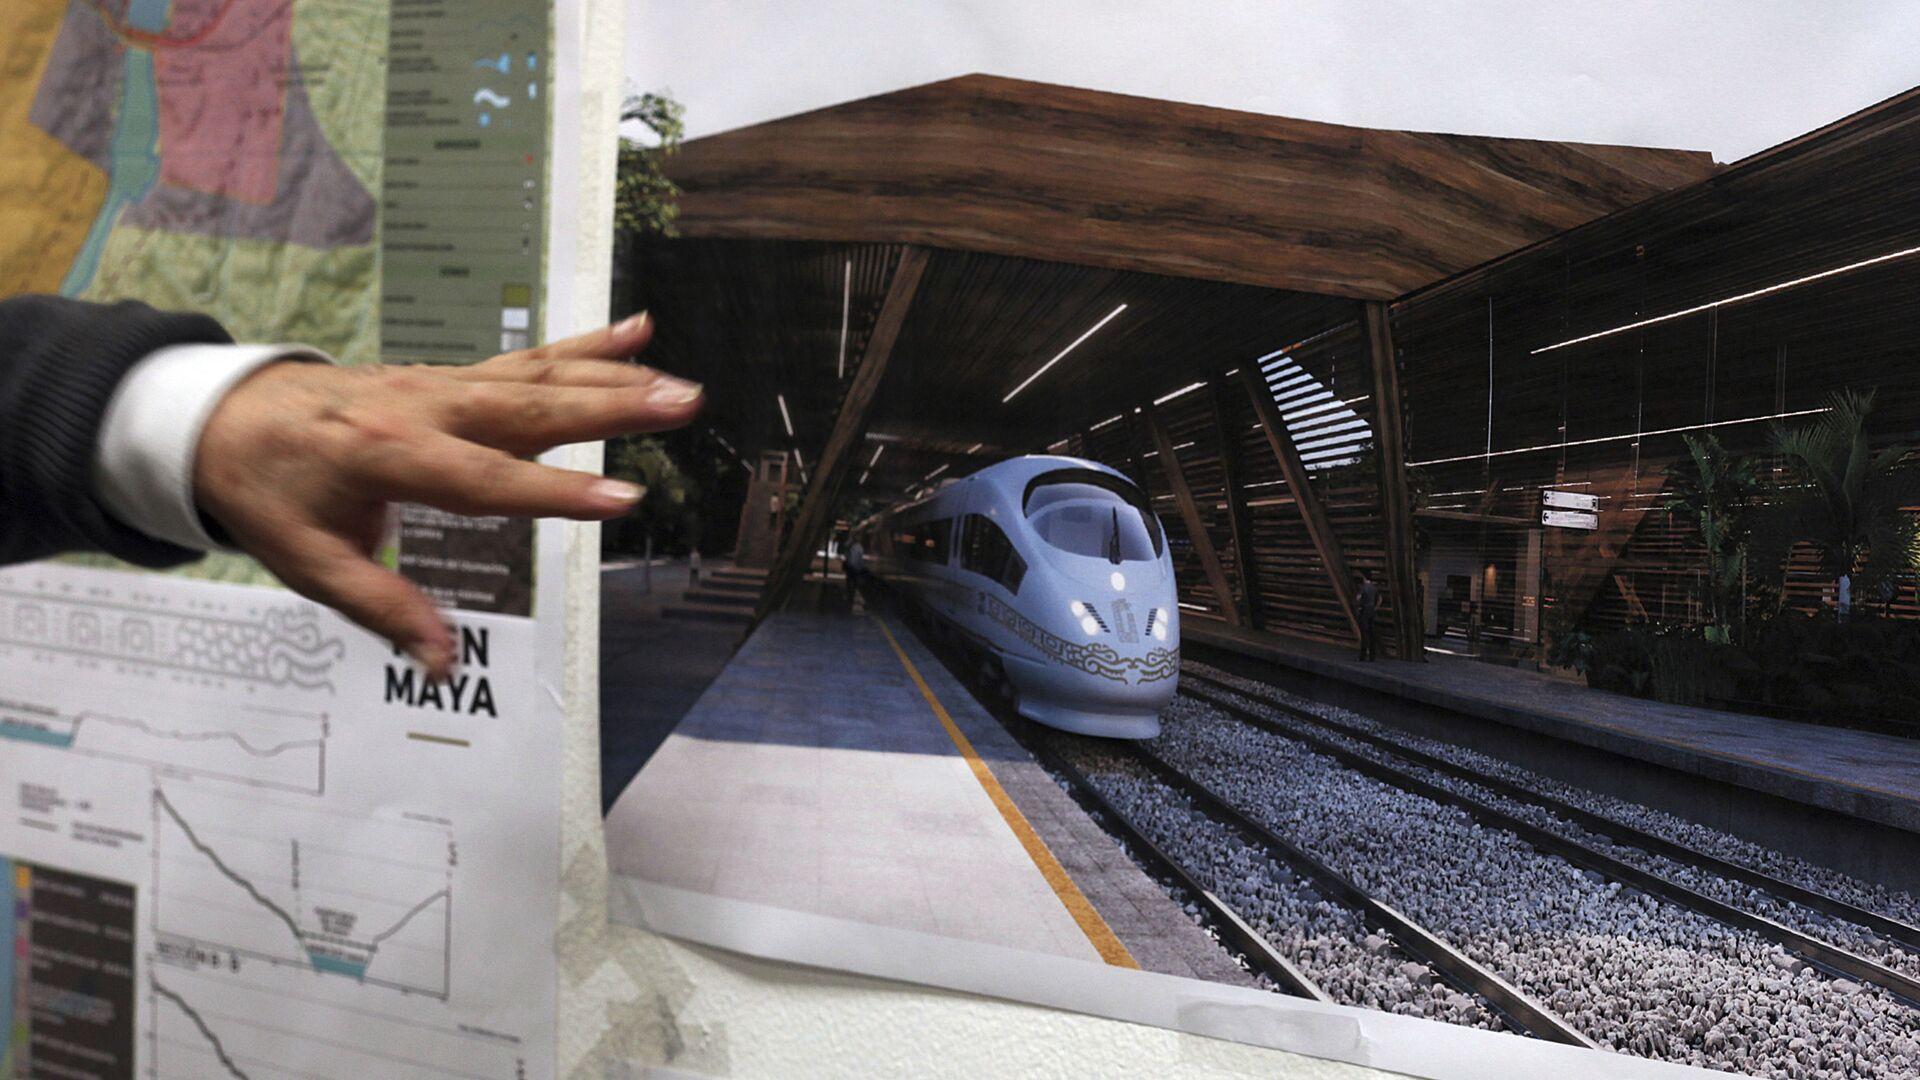 El plan de construcciones del Tren Maya - Sputnik Mundo, 1920, 25.08.2021